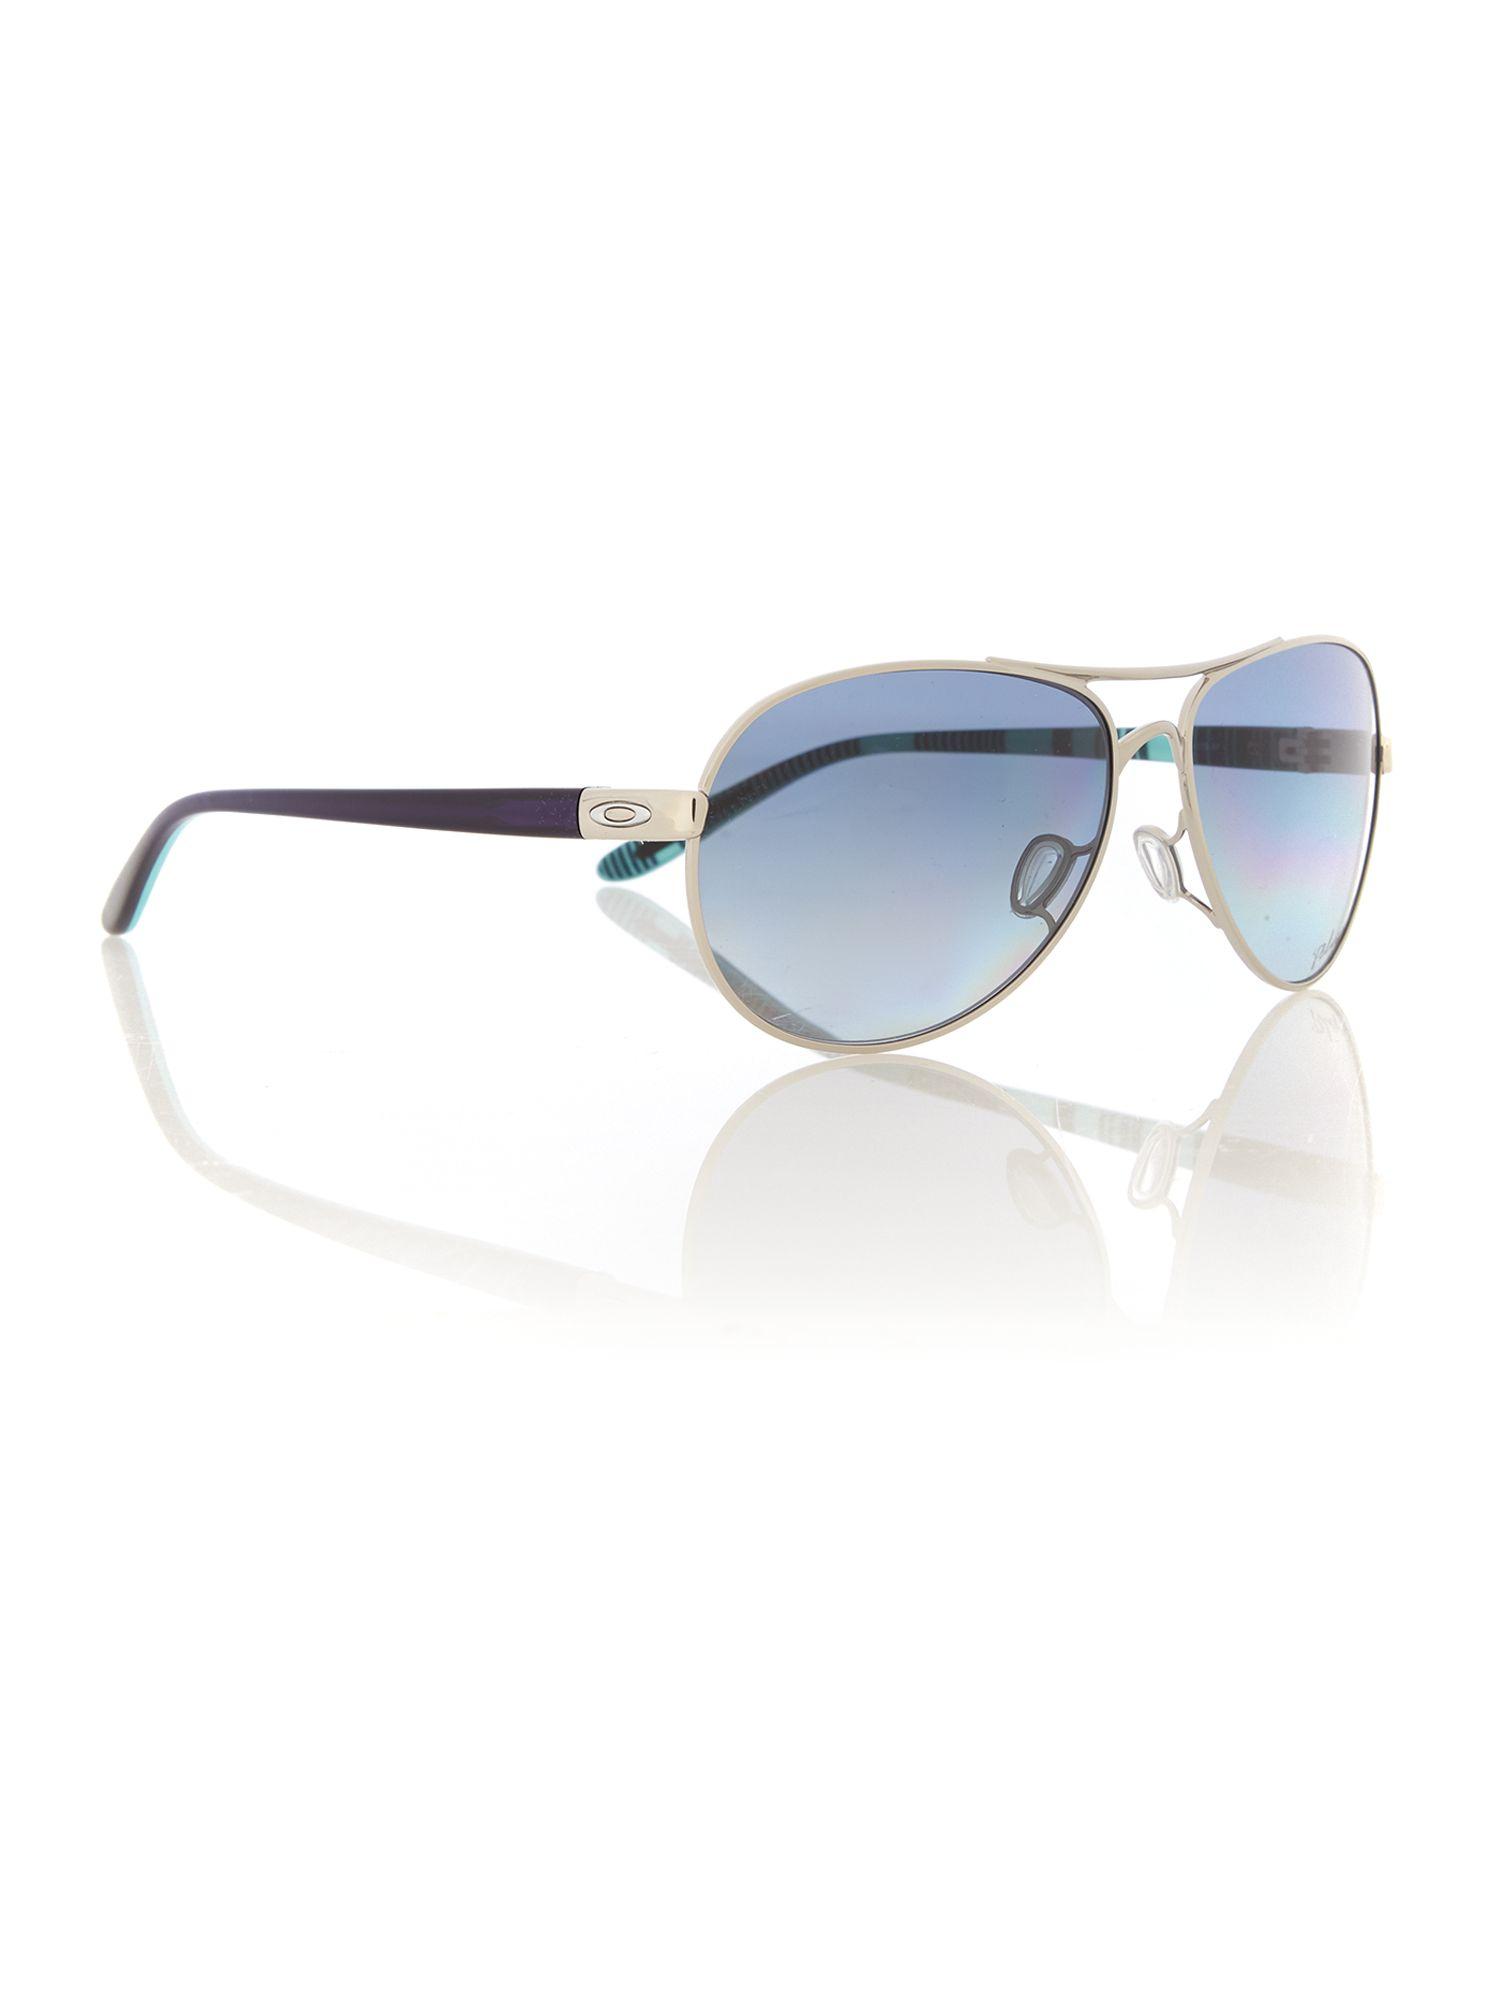 96164461d7 Oakley Ladies Pilot Sunglasses « Heritage Malta